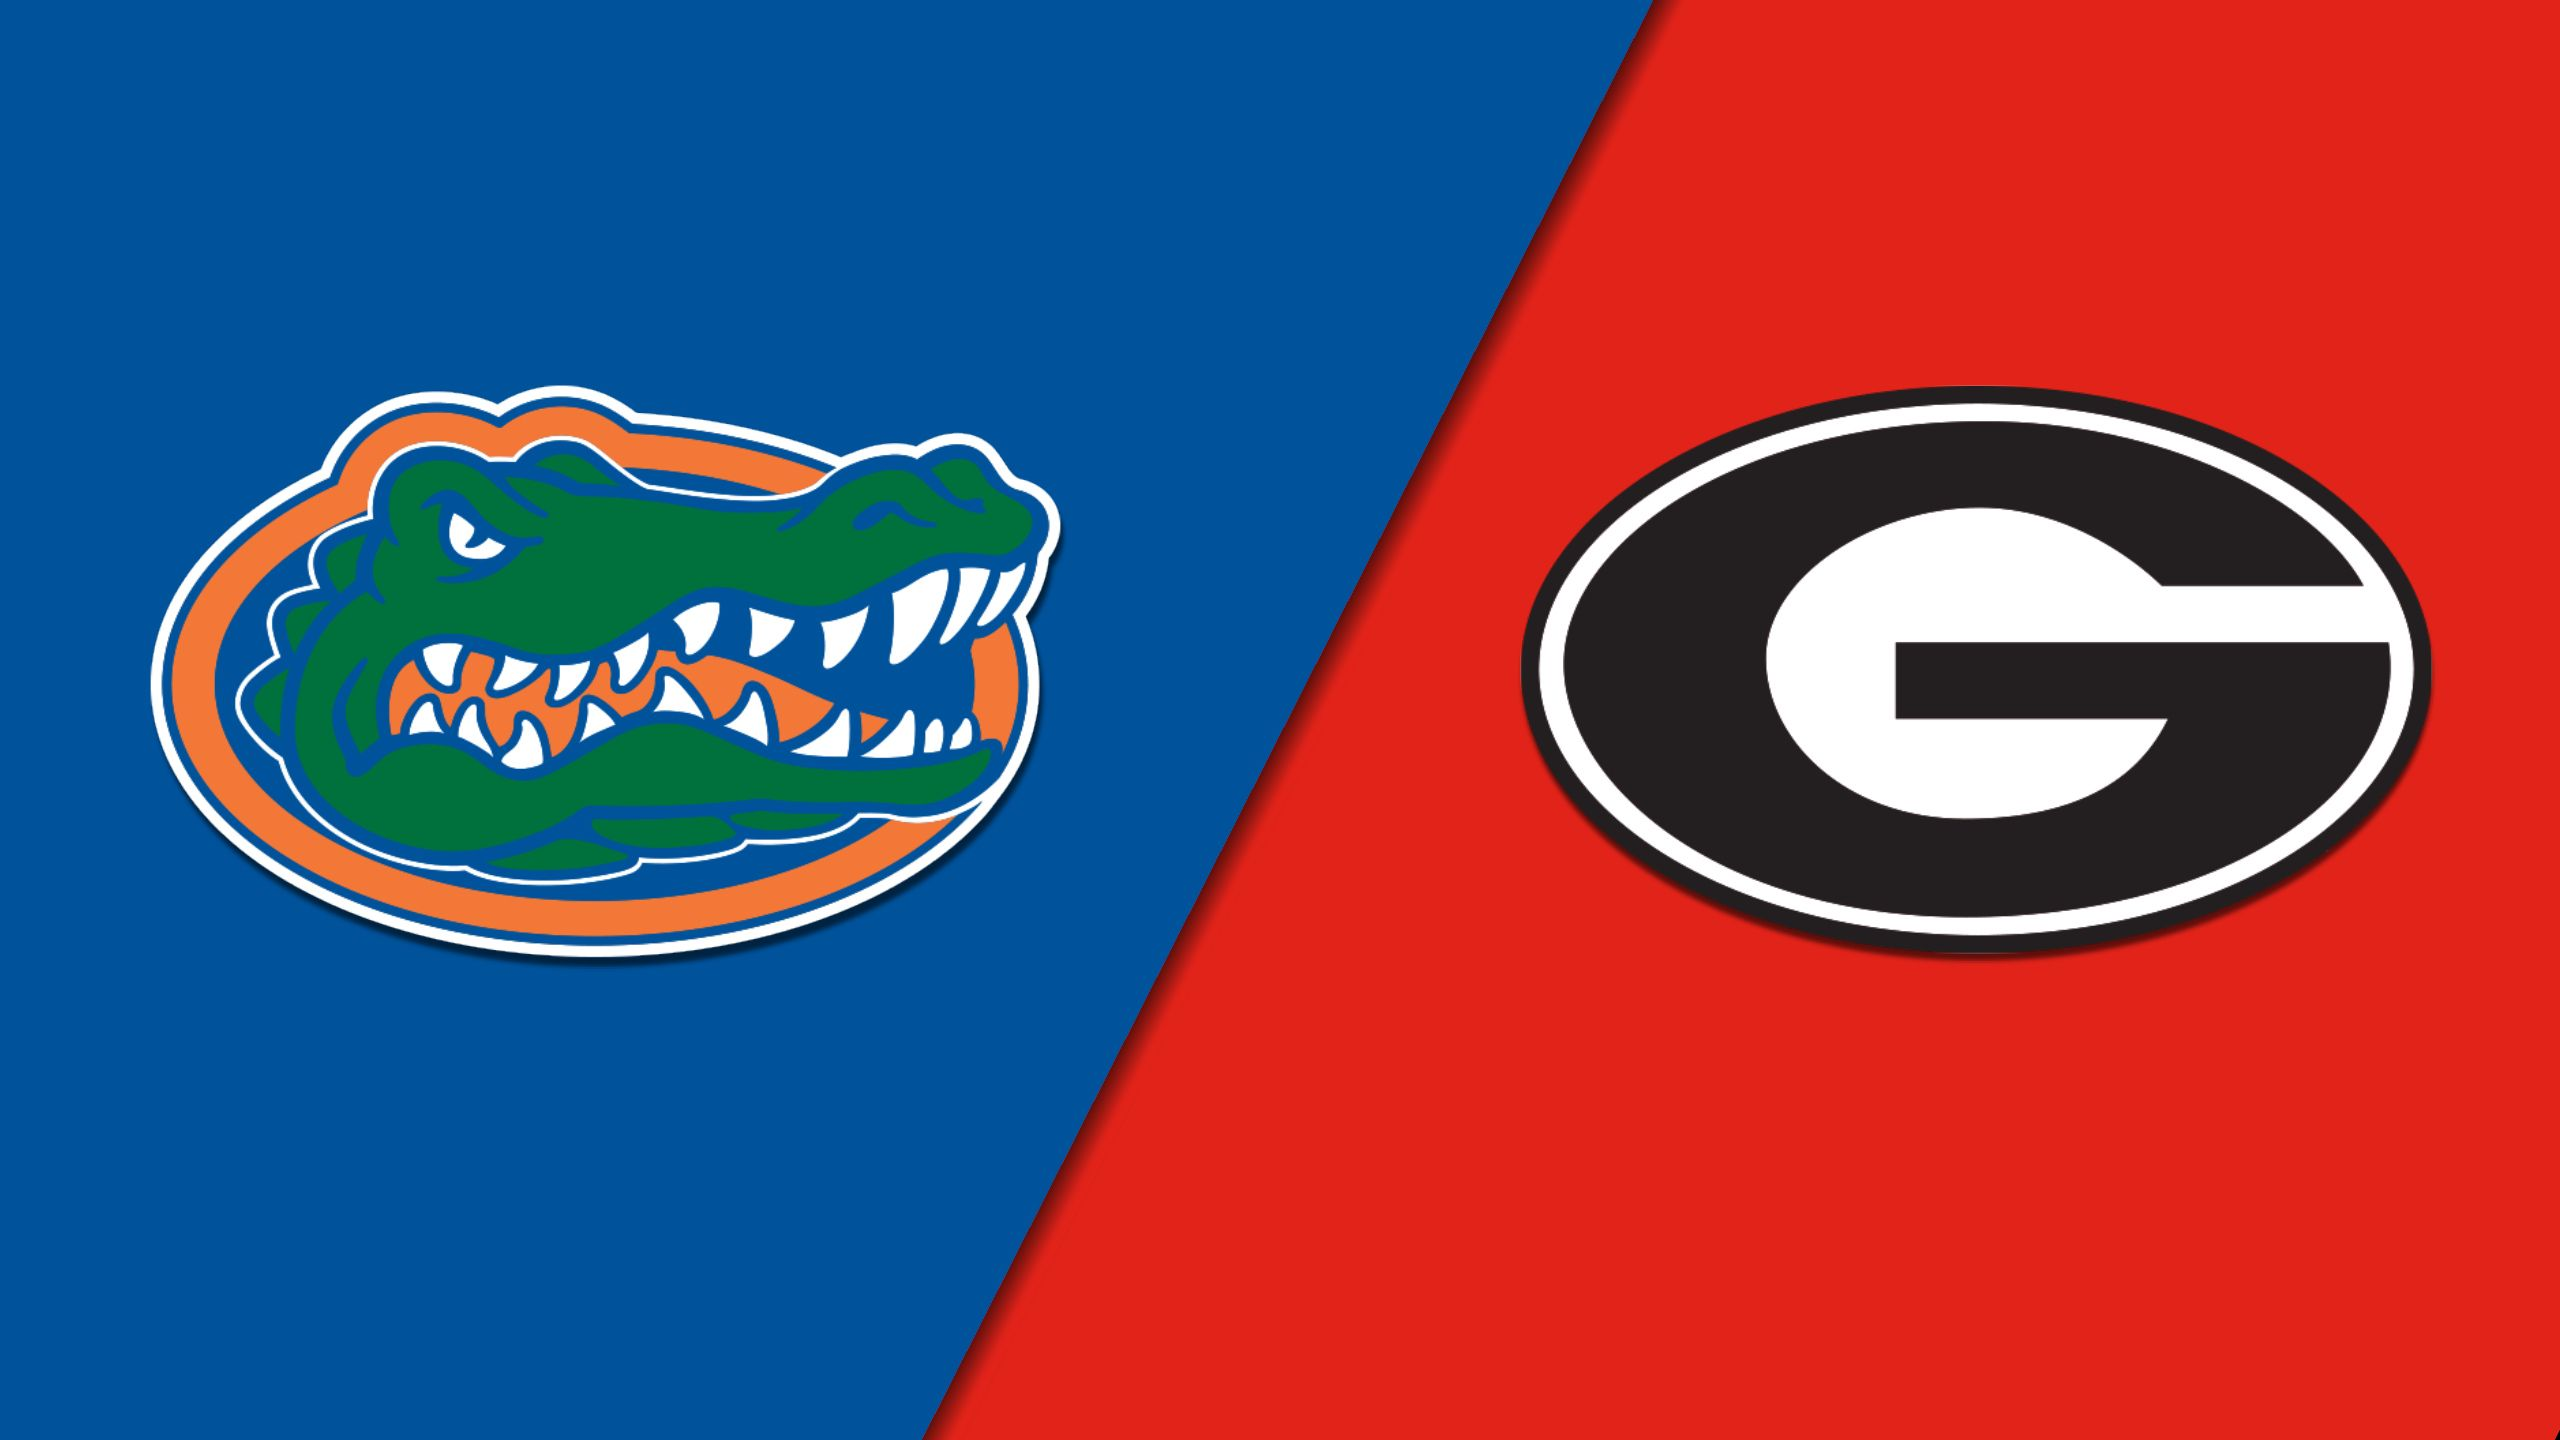 #3 Florida vs. #12 Georgia (Softball)